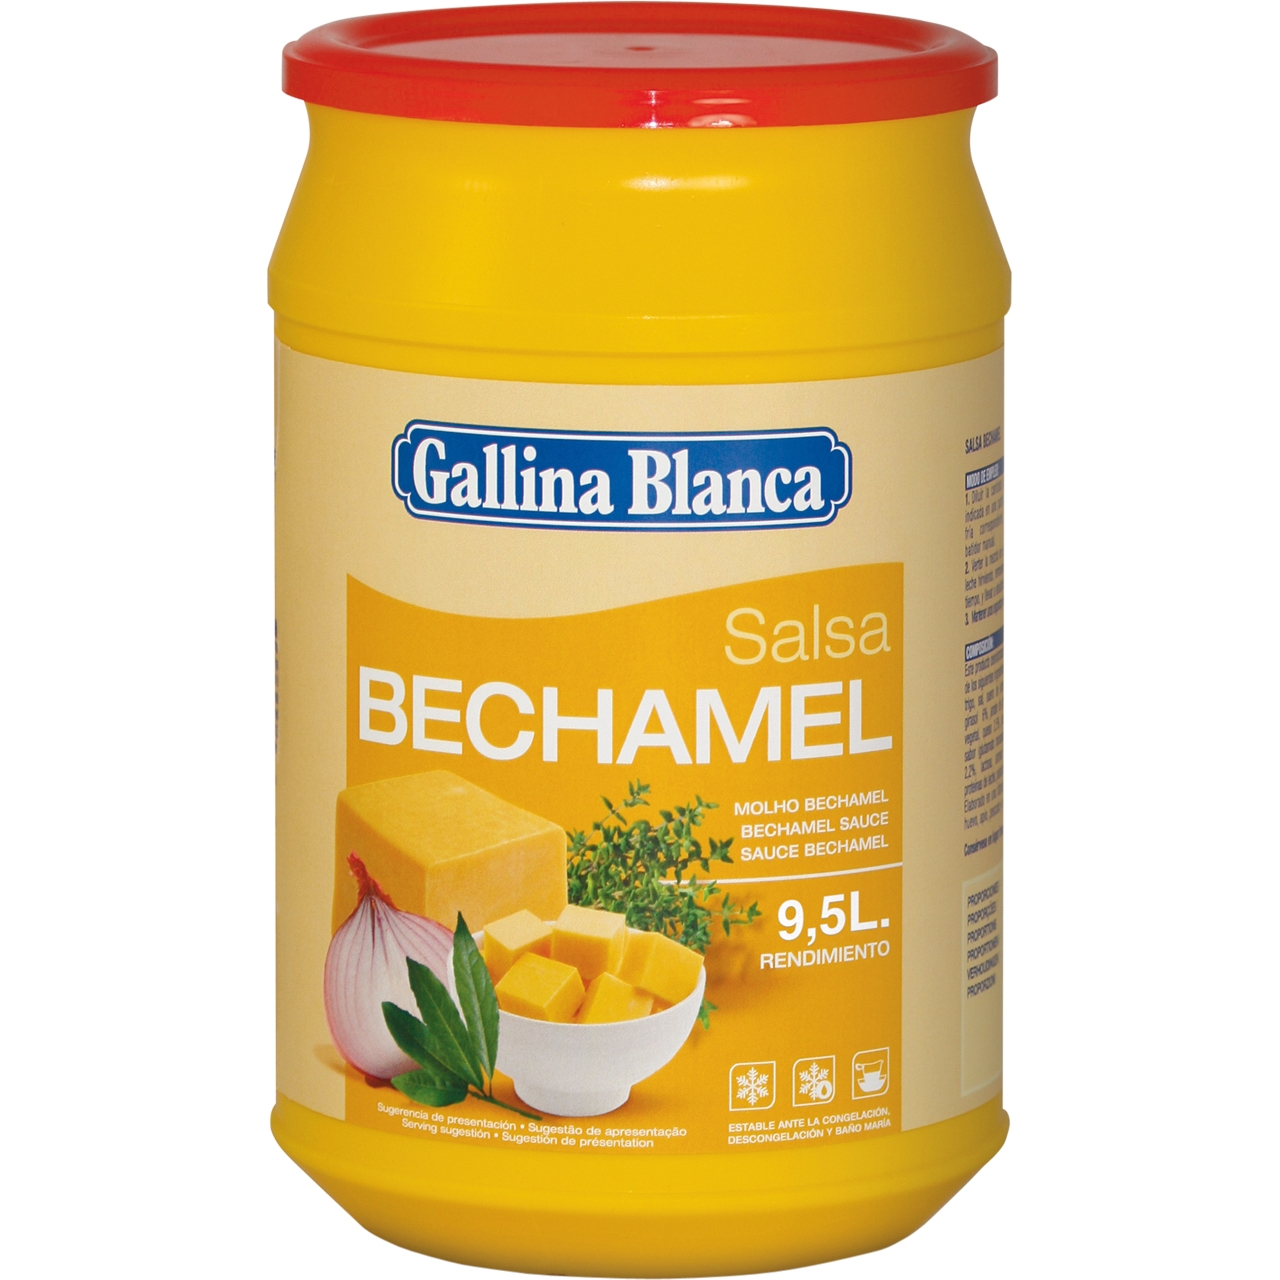 Salsa beixamel deshidratada 1kg. Gallina Blanca